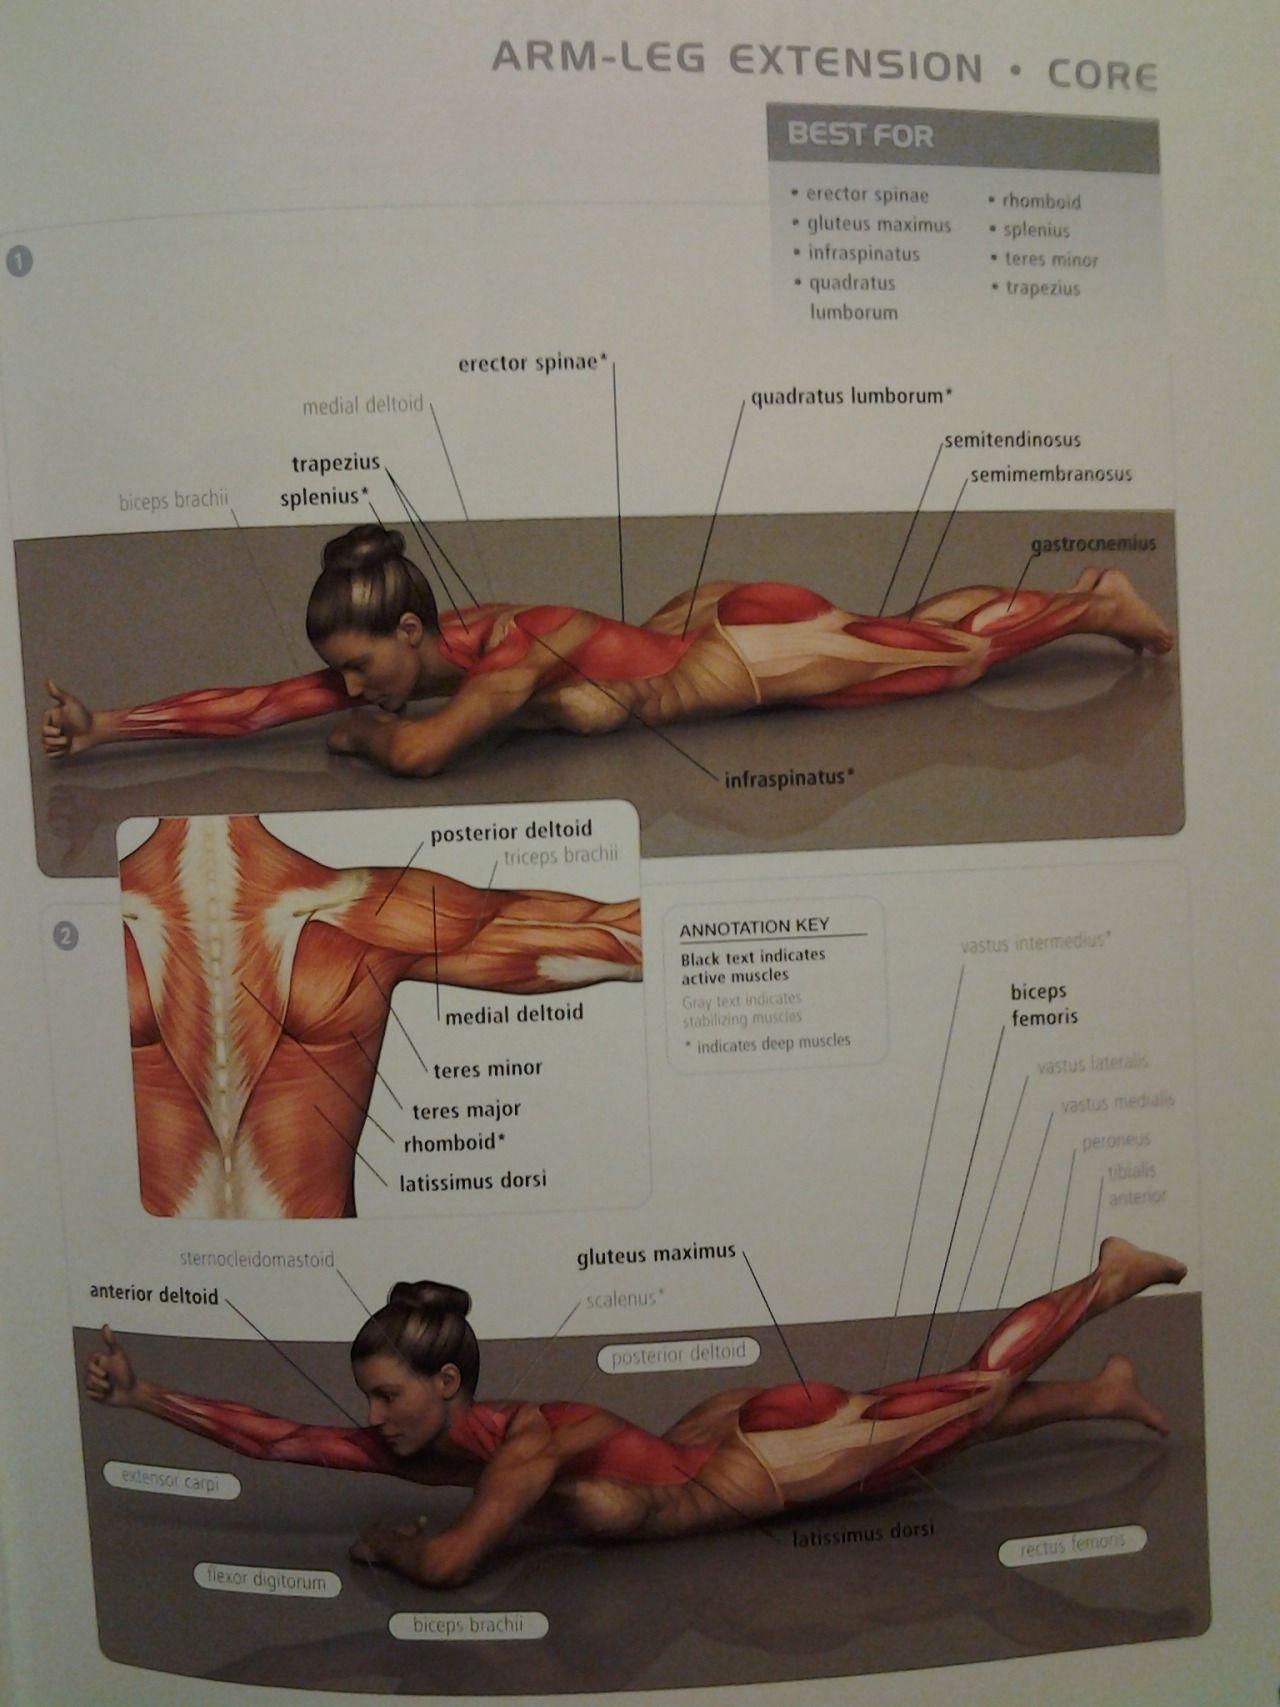 CORE armleg extension back muscles u gluteus maximus  rep